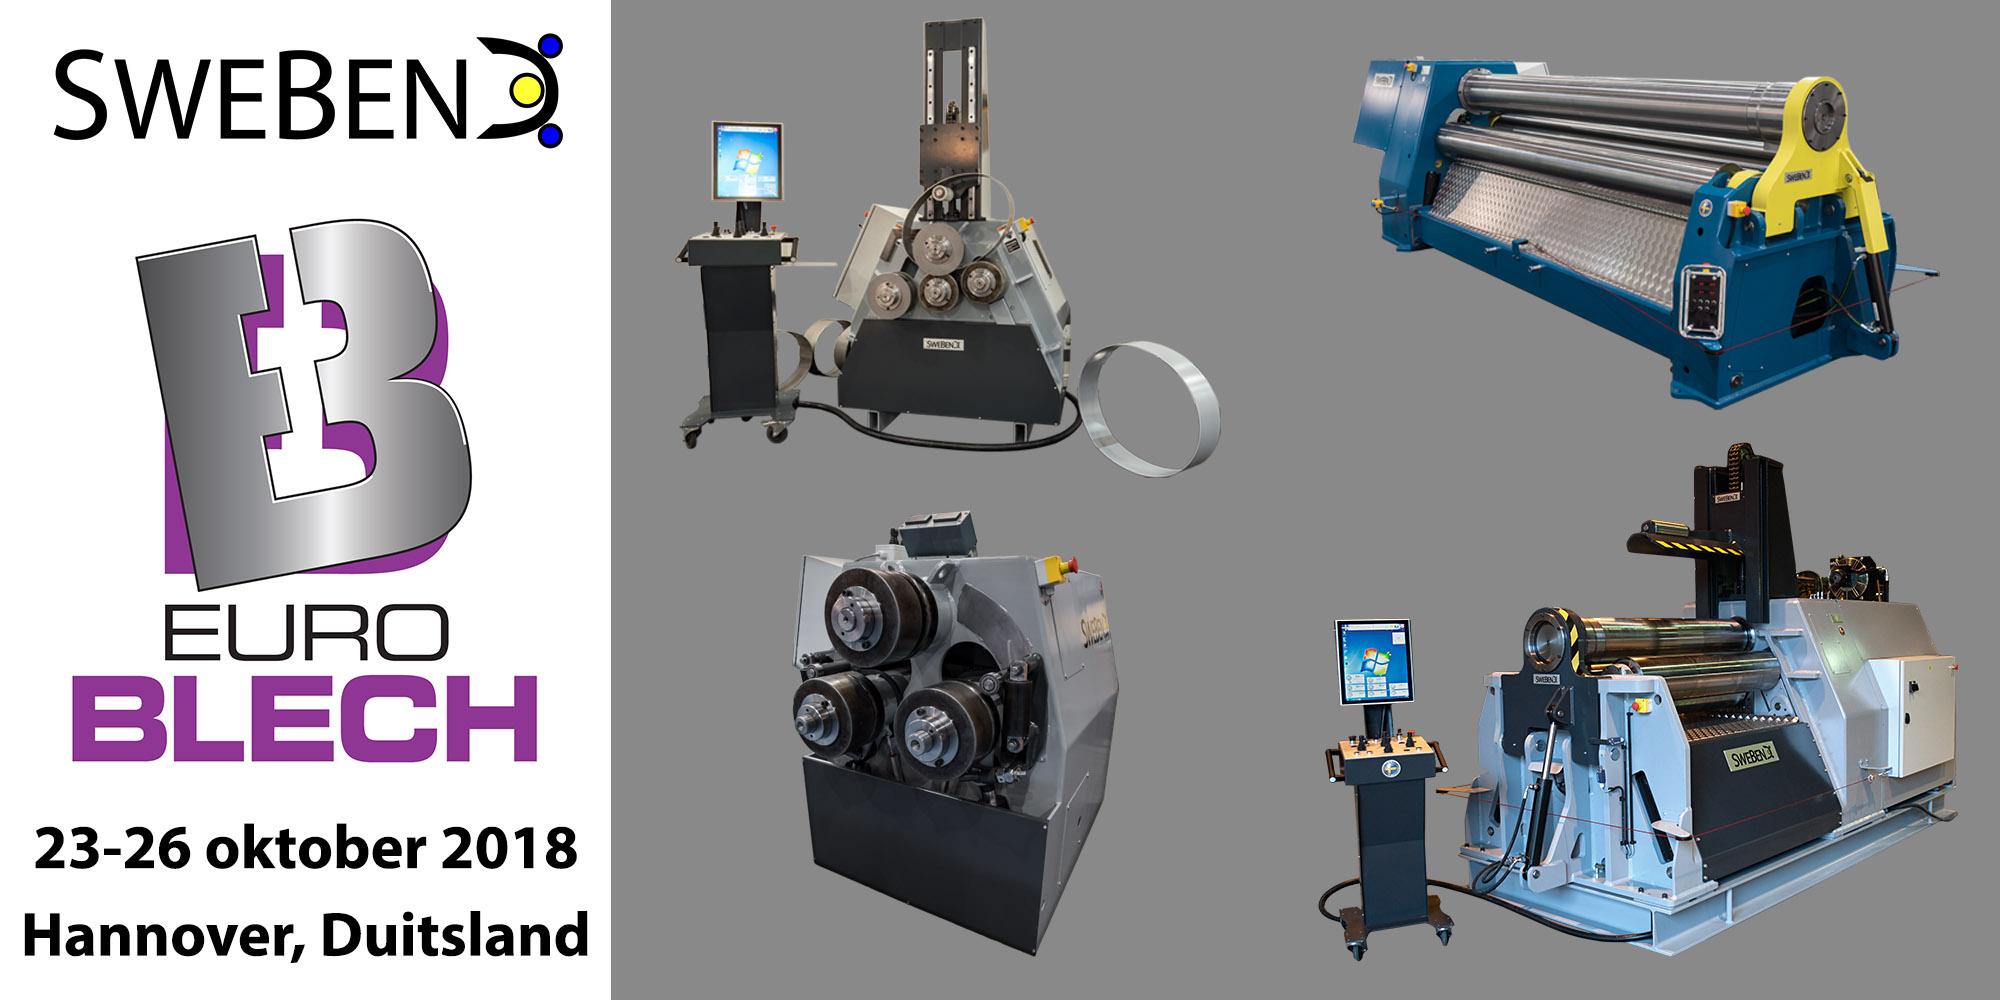 J. Venema B.V. | SweBend AB | EuroBlech 2018 | profielwals | platenwals | CNC besturing | machine revisie